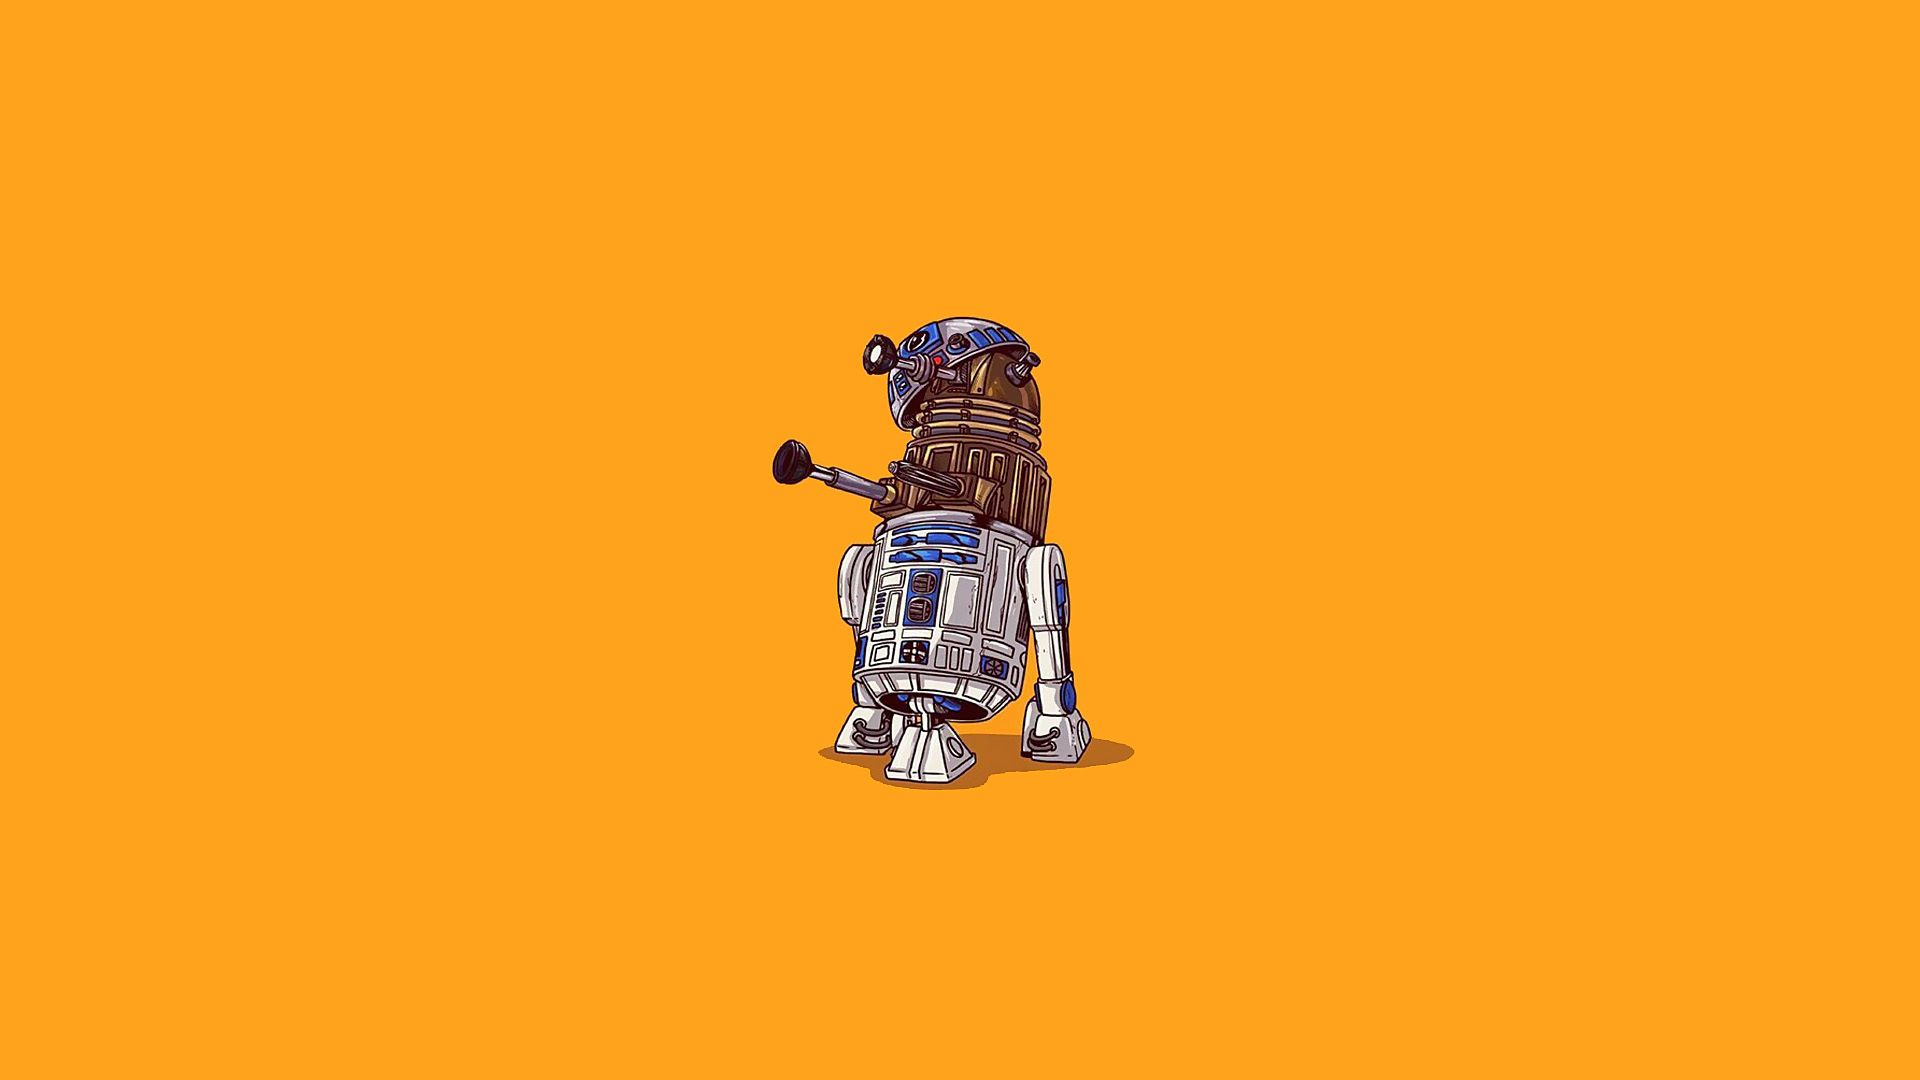 Star Wars Minimalist Wallpaper and Background